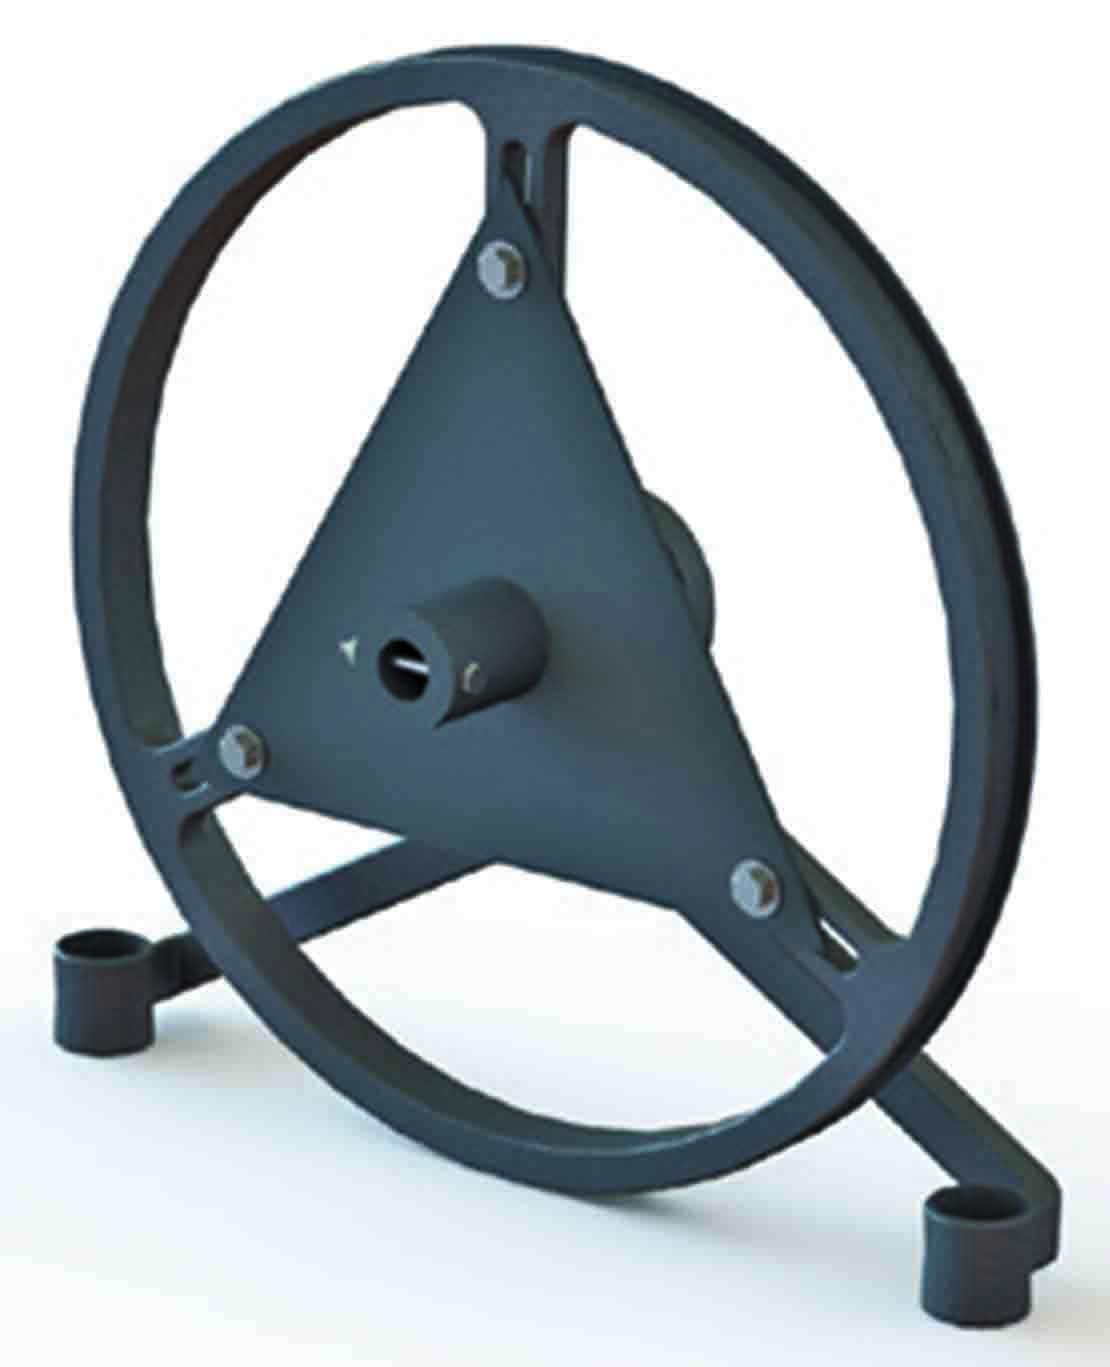 DYNATORQUE chainwheel.